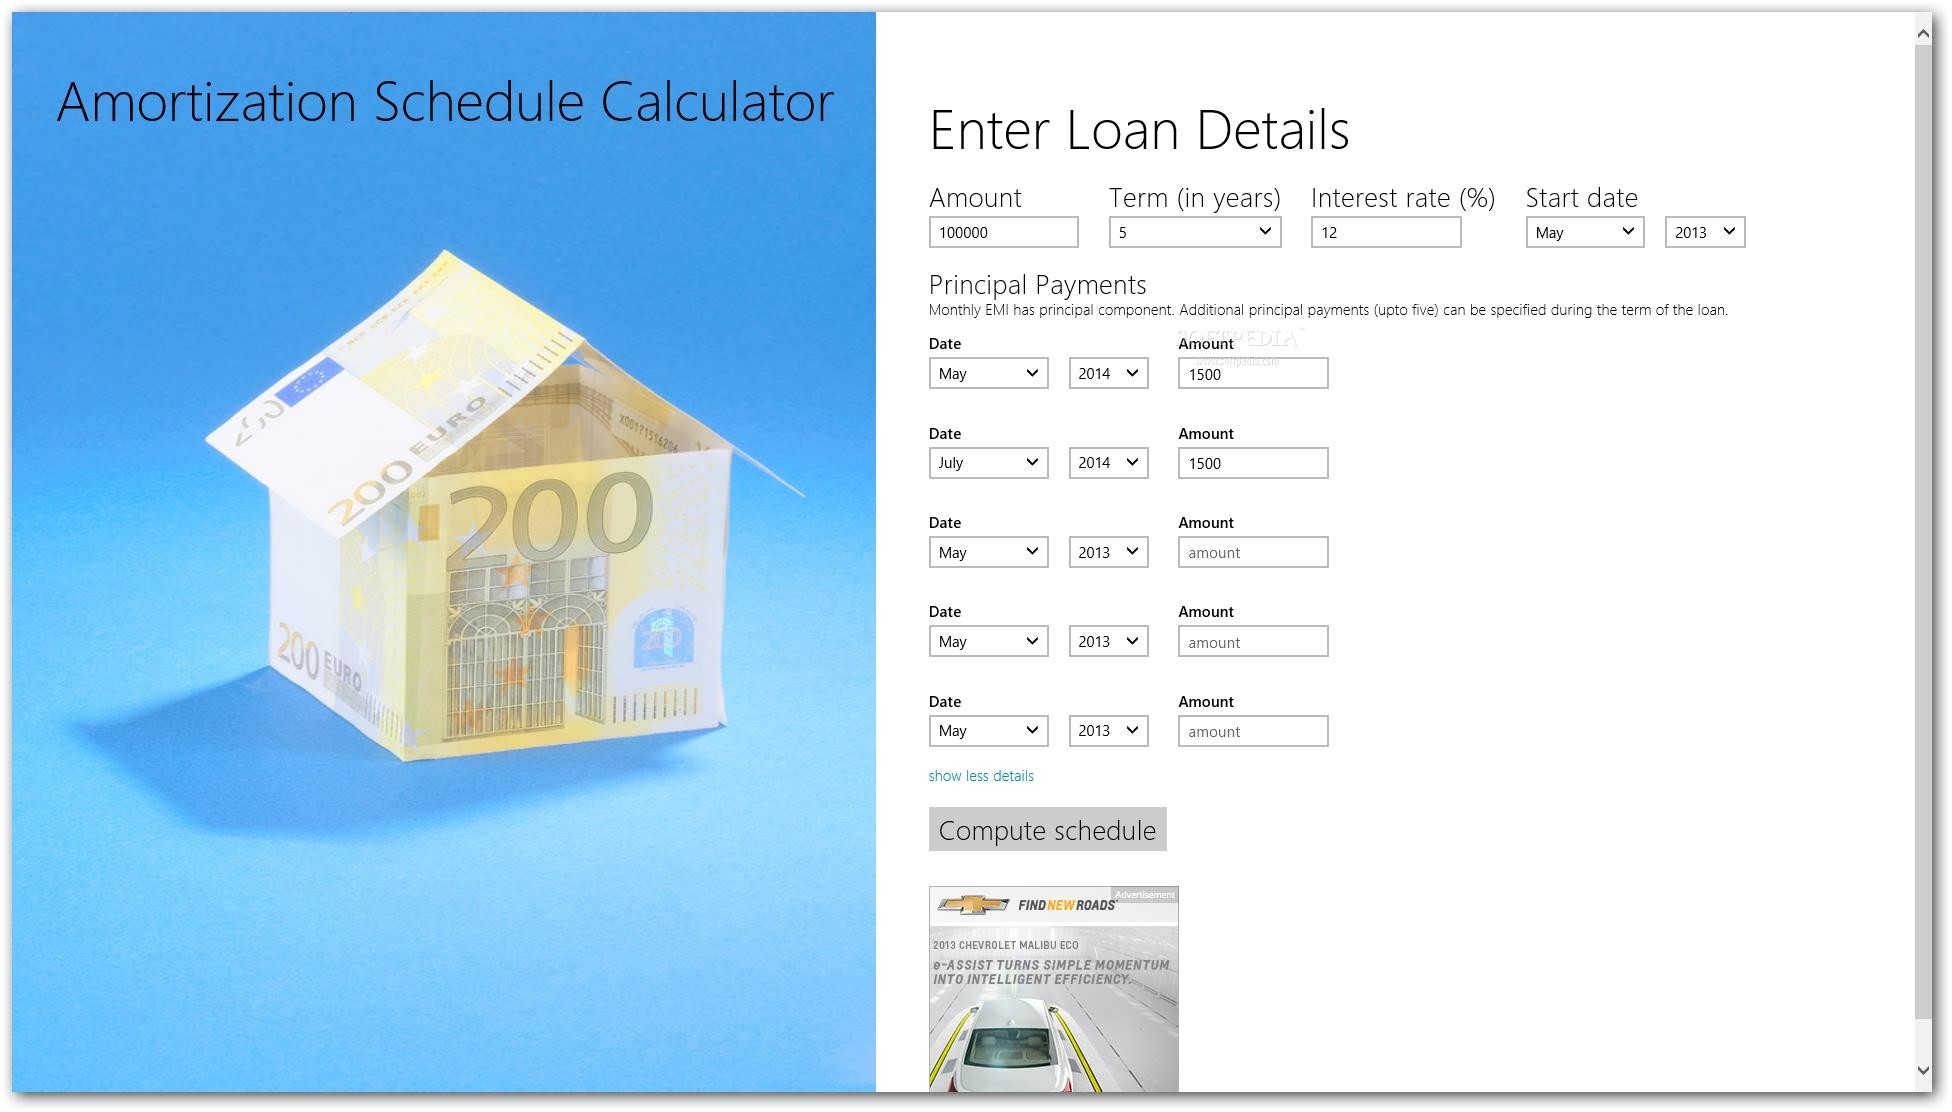 download amortization schedule calculator 0 3 0 4